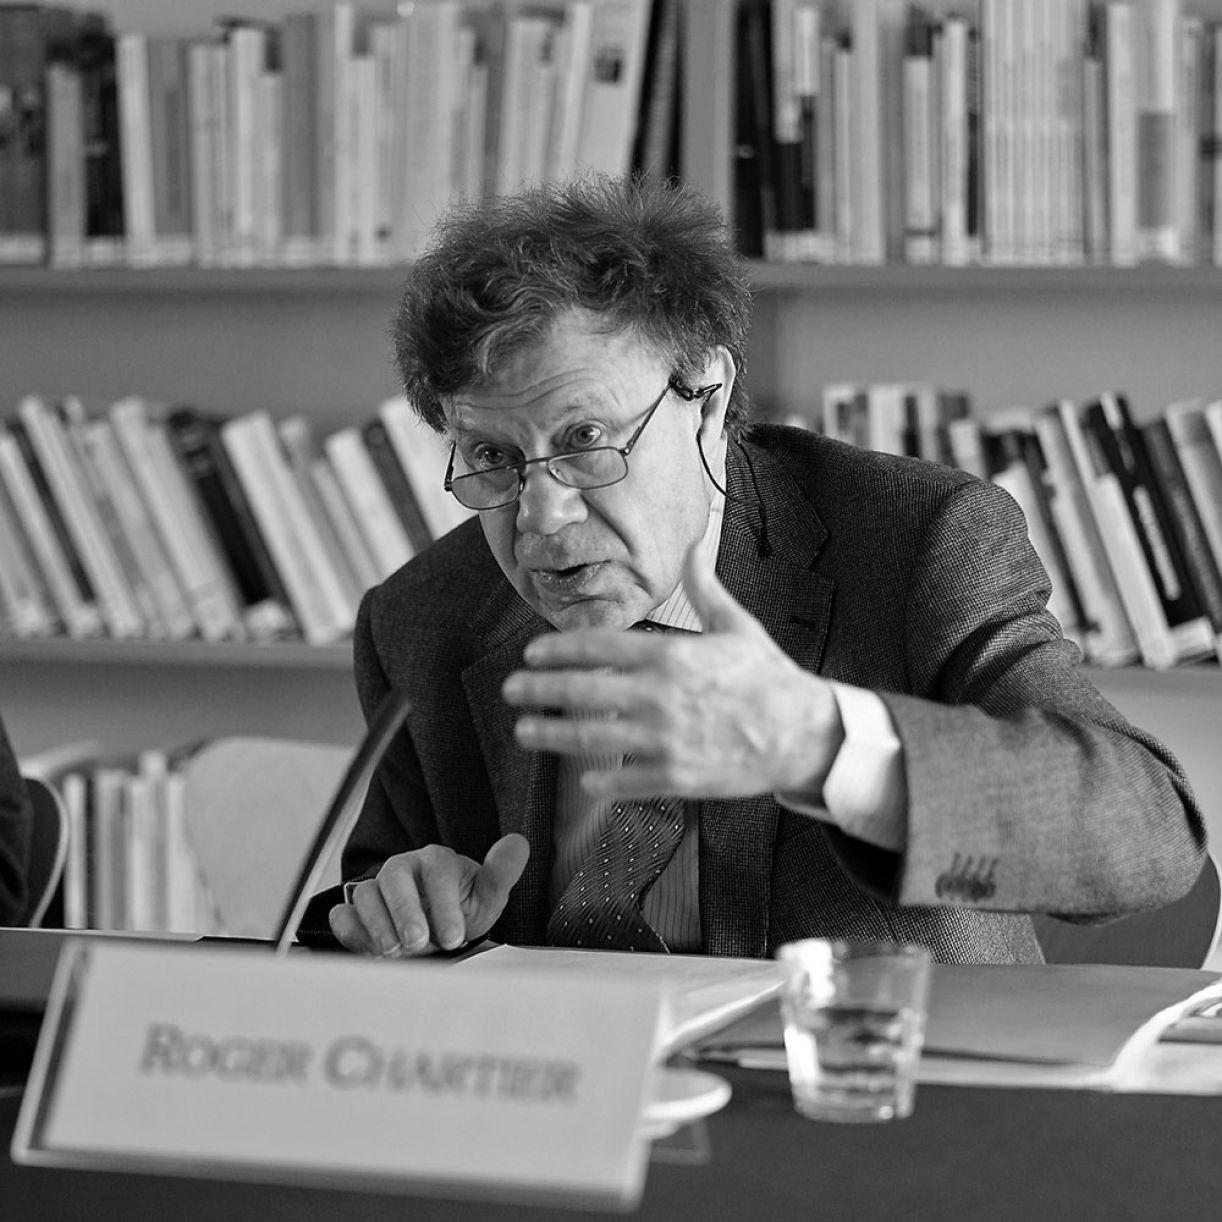 Roger Chartier